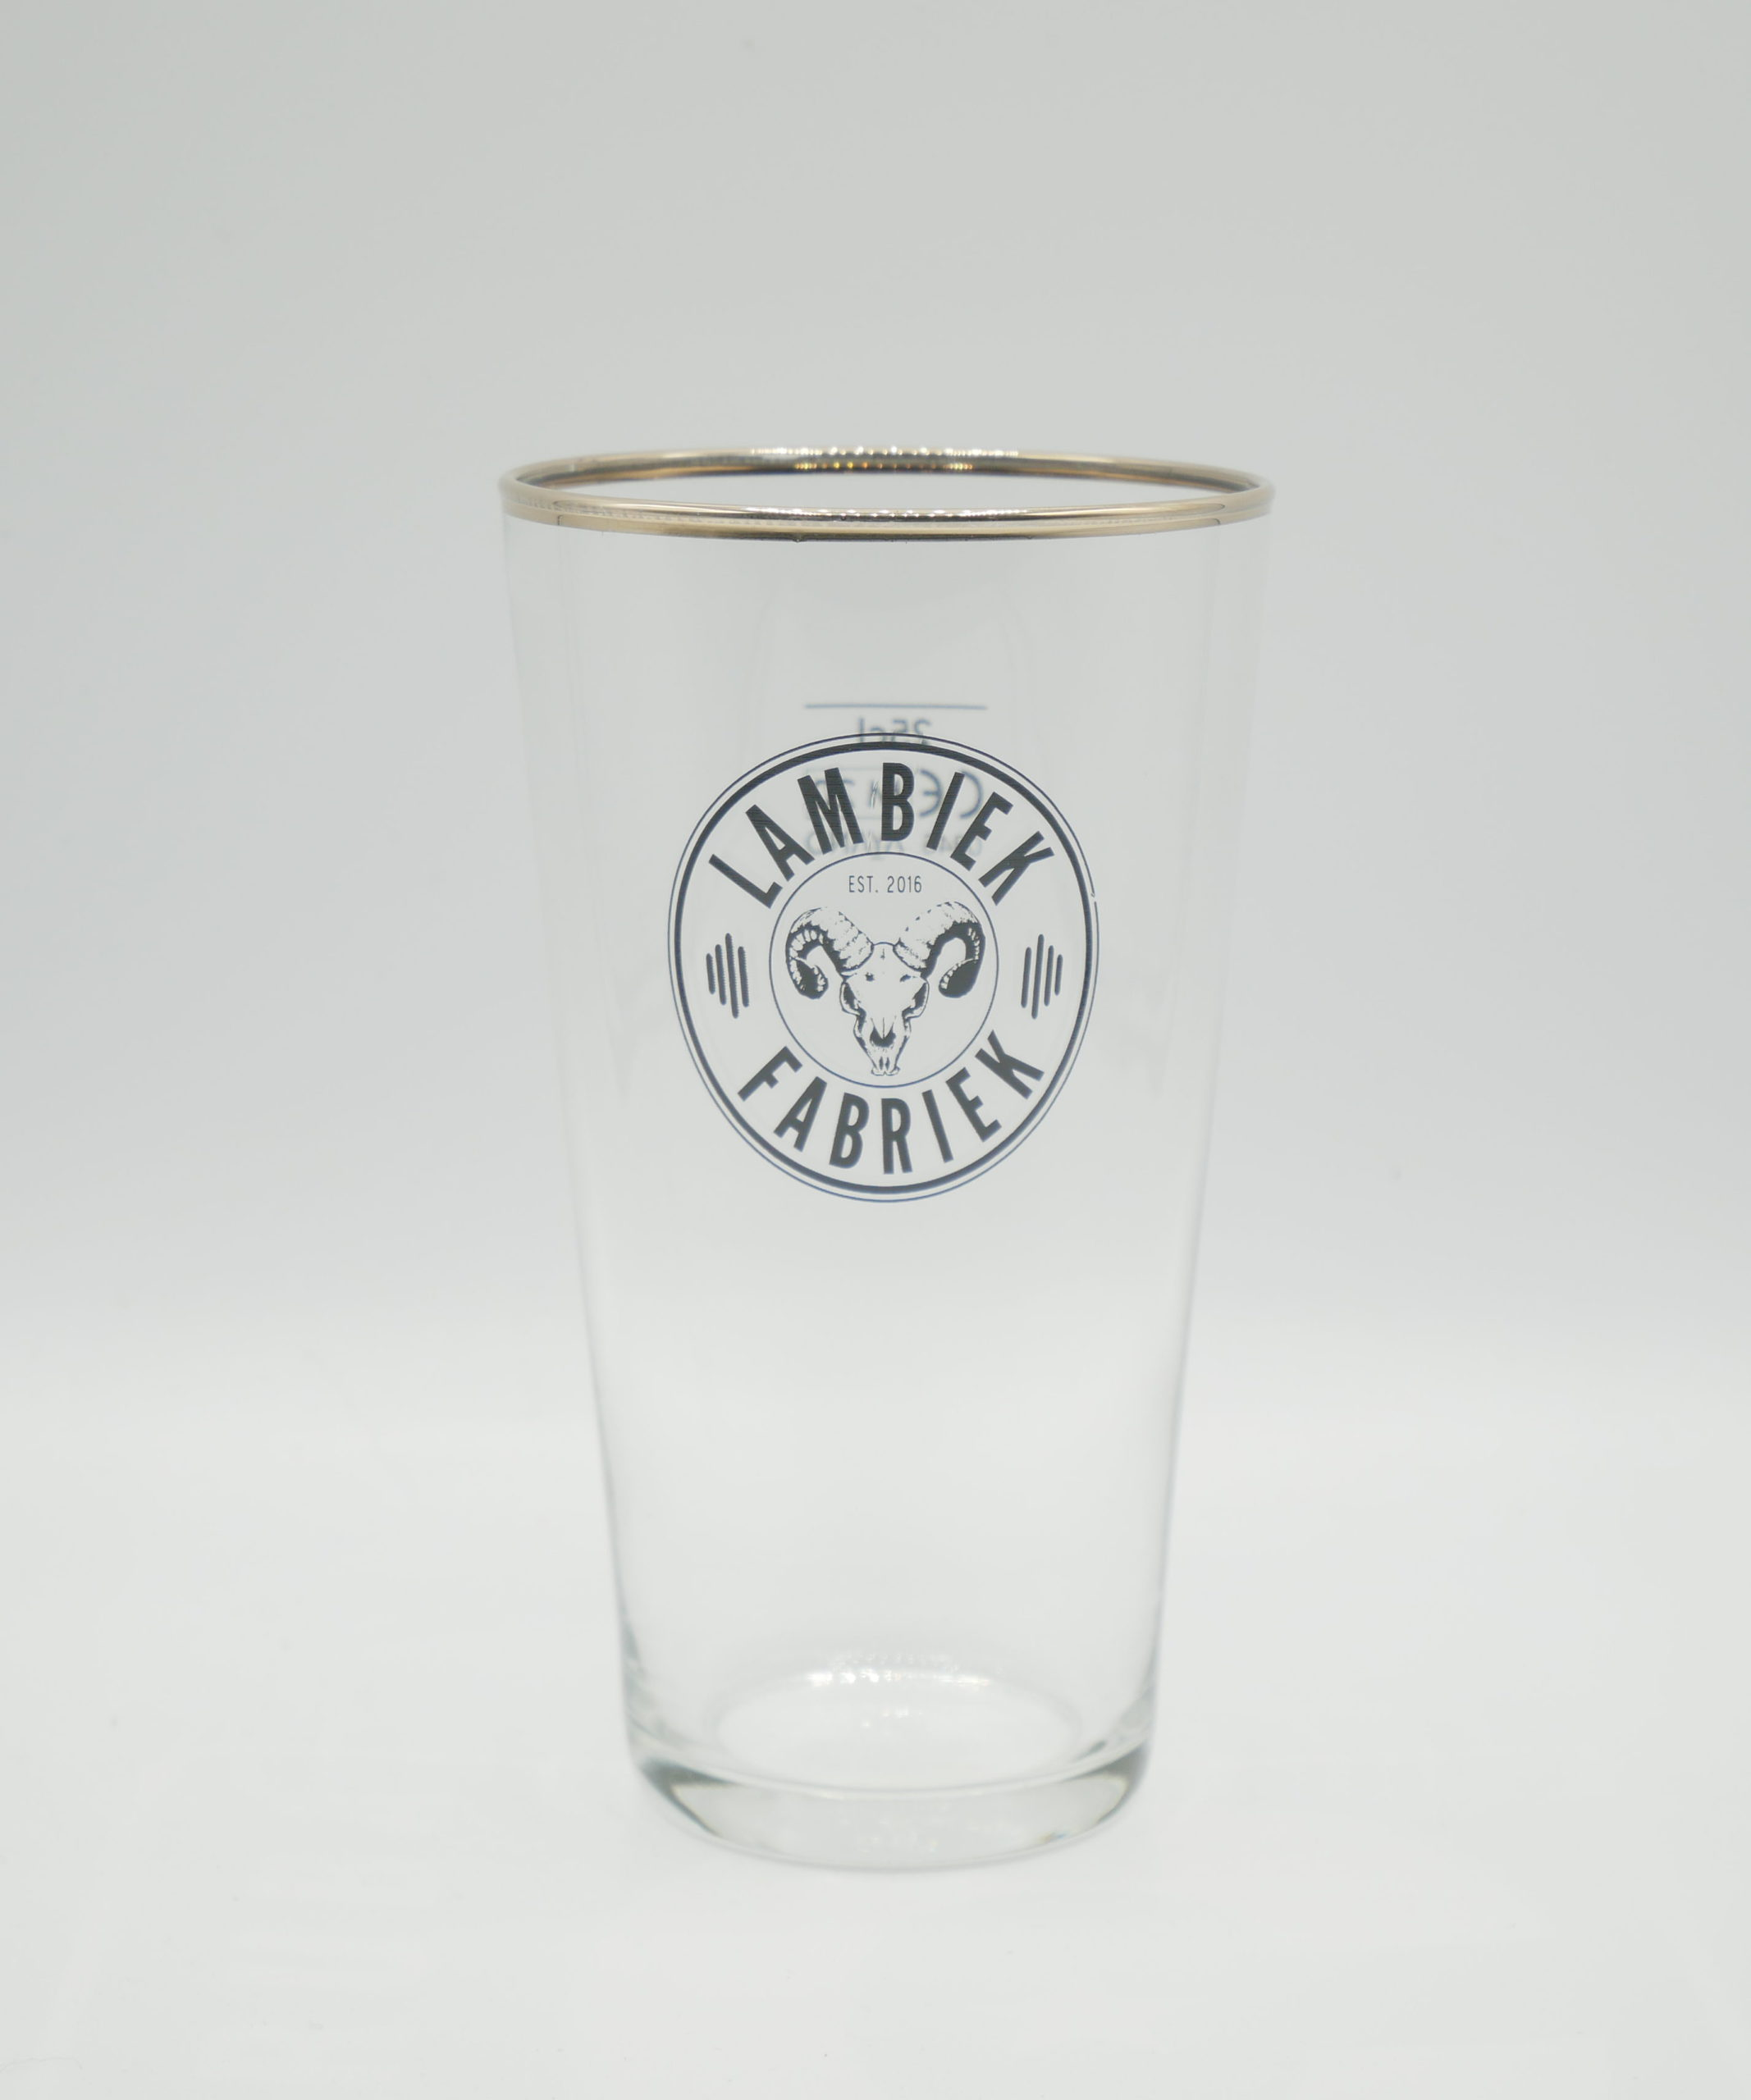 Image Lambriek Fabriek Glass